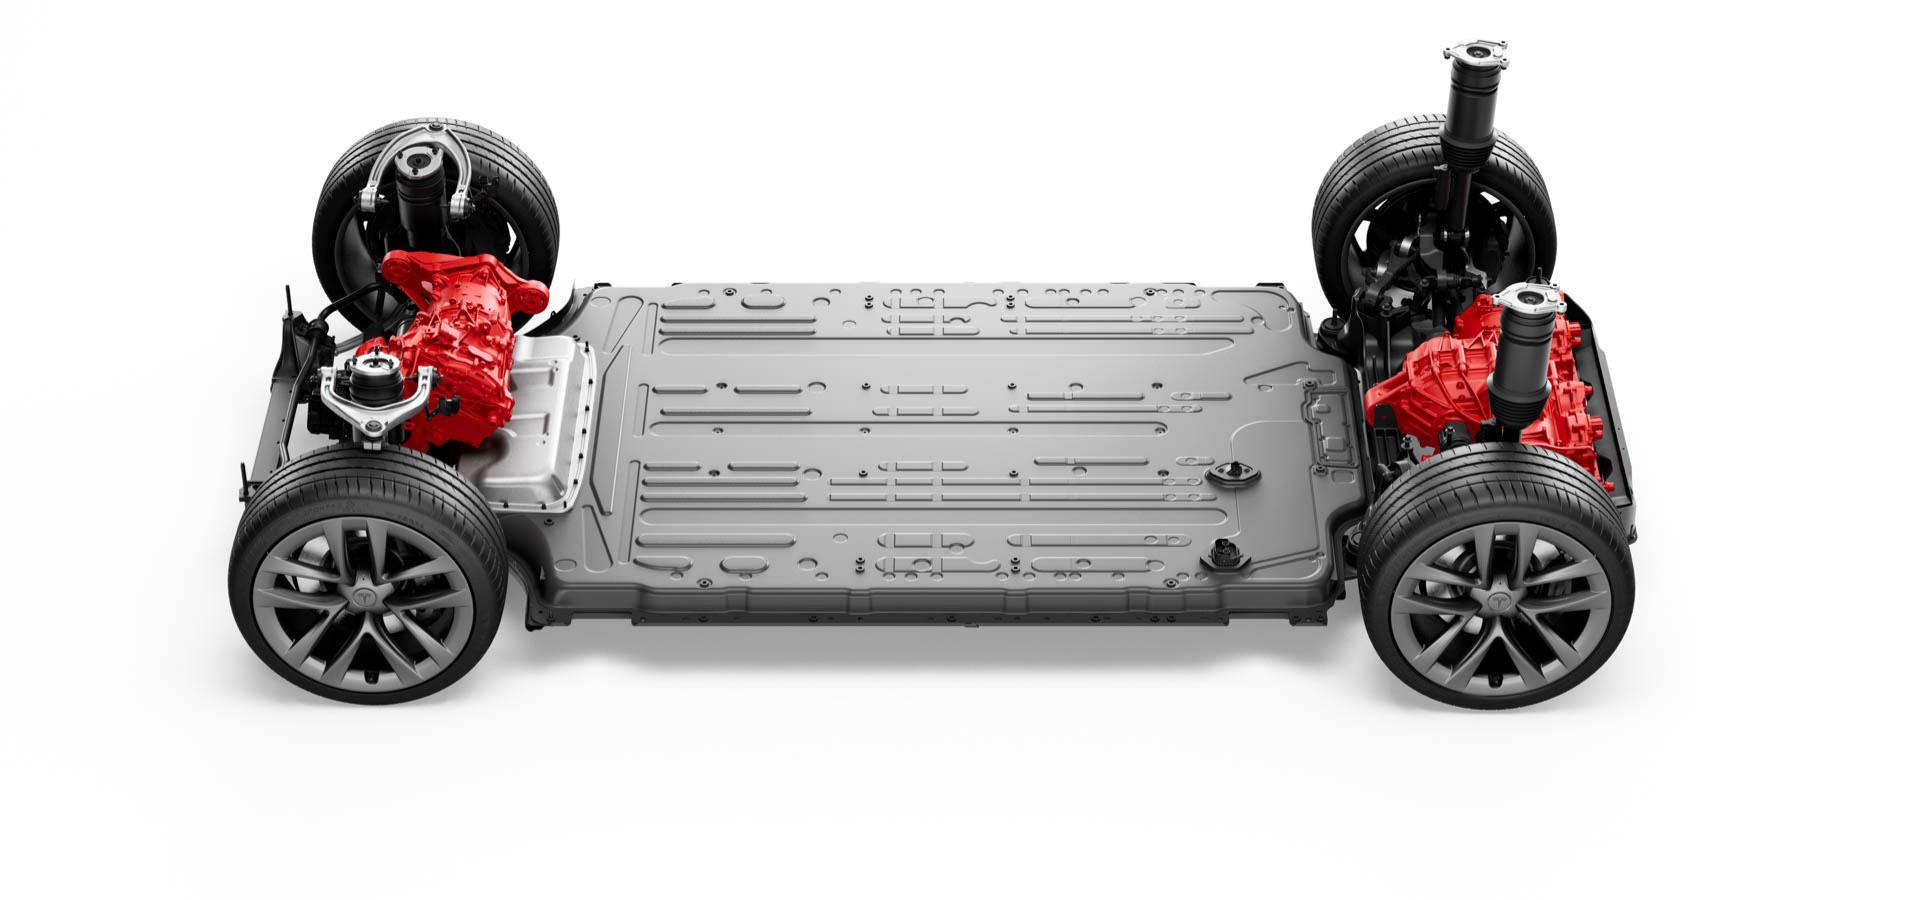 Model S Tri Motor All-Wheel Drive